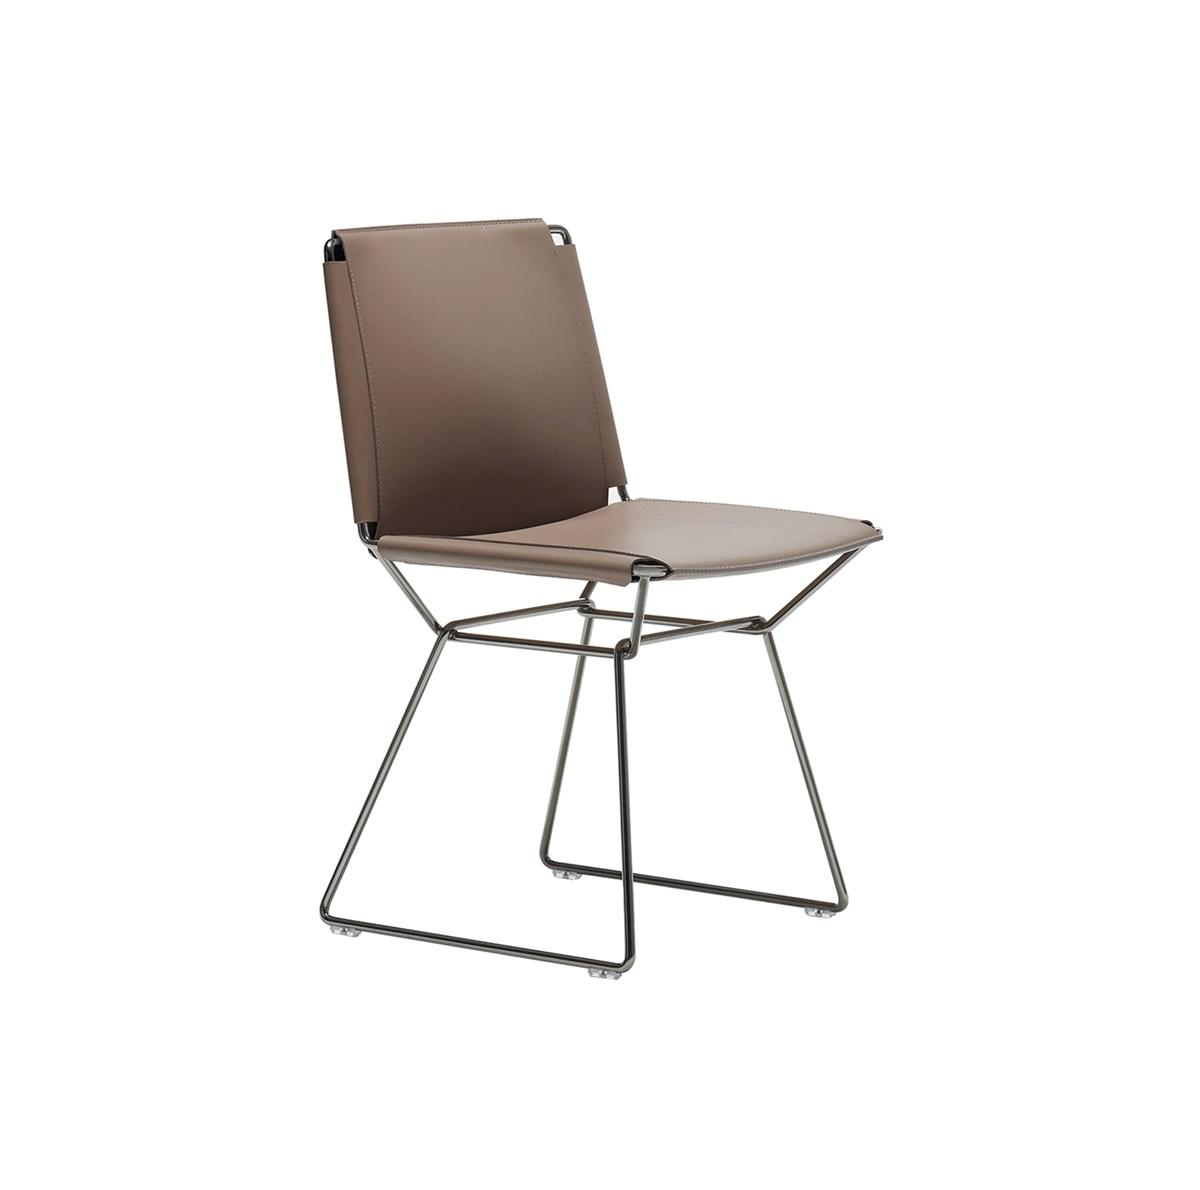 MDF-Italia-Jean-Marie-Massaud-Neil-Leather-Chair-Matisse-1